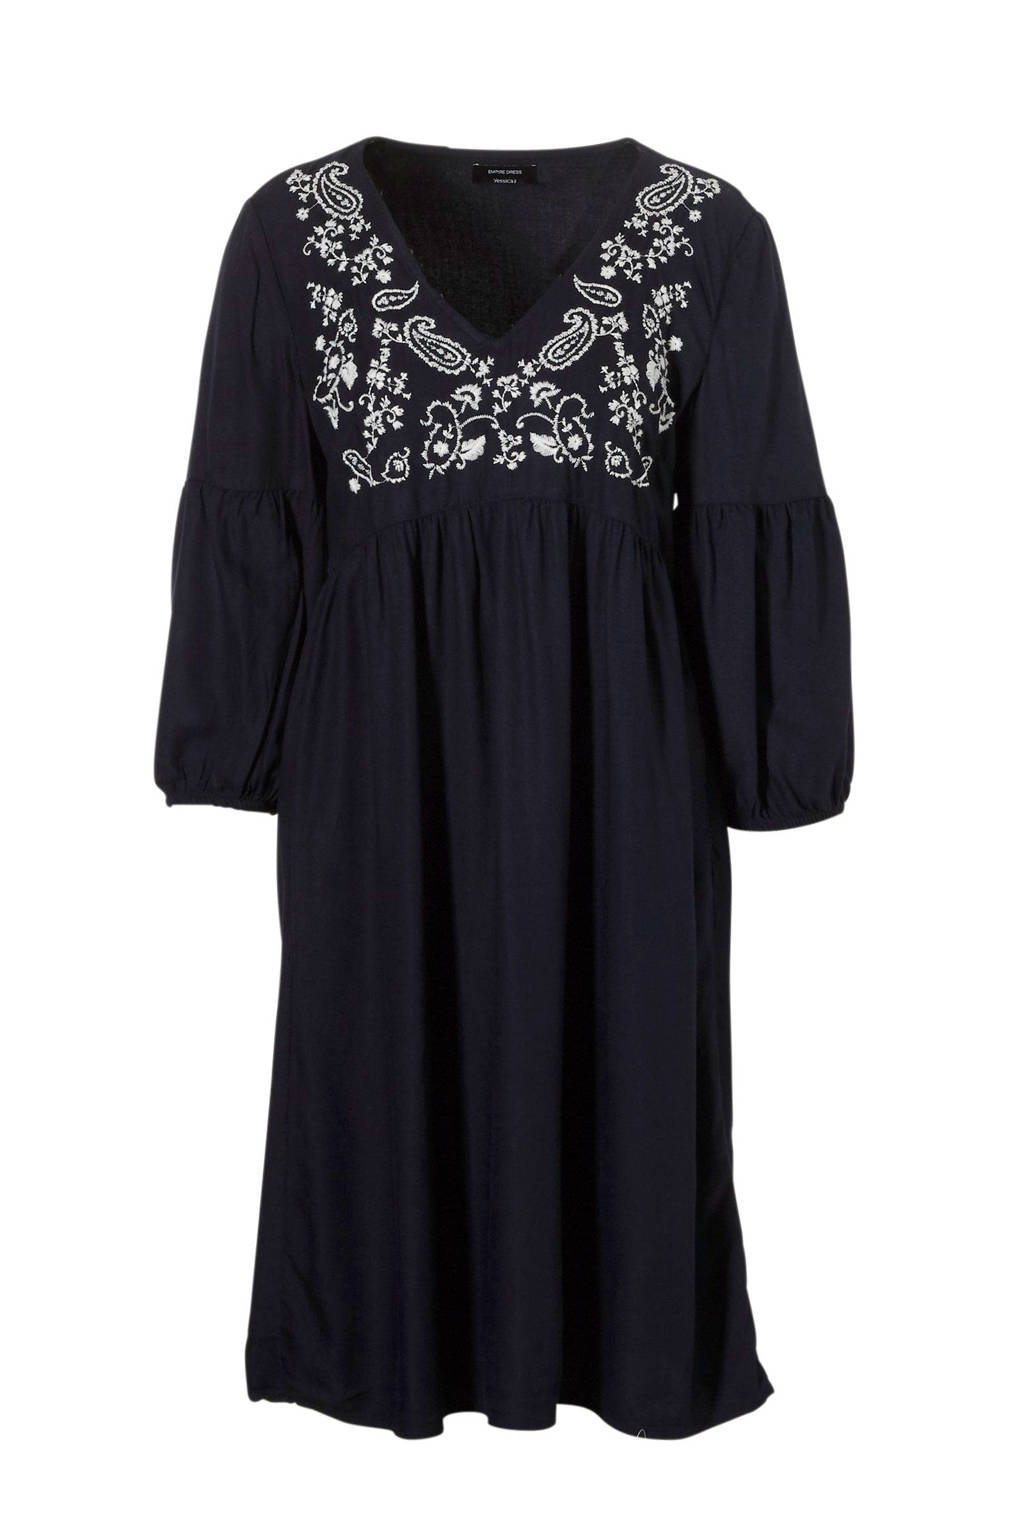 C&A Yessica jurk met borduursel donkerblauw, Donkerblauw